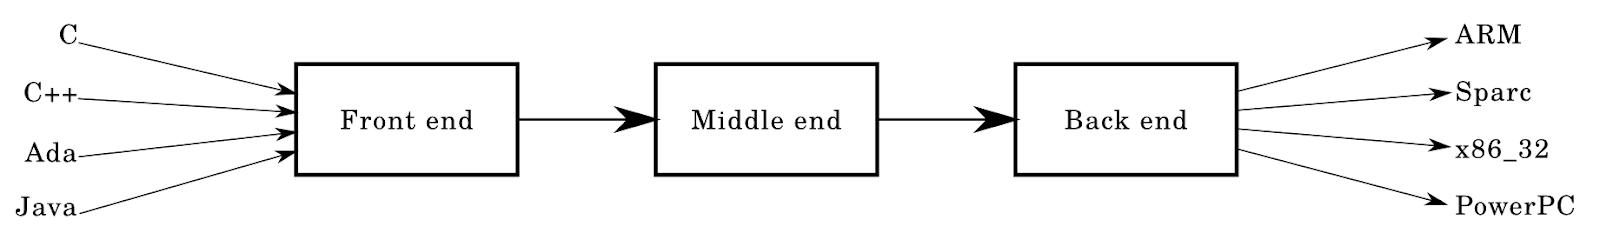 Краткий и бодрый обзор архитектуры компиляторов - 2